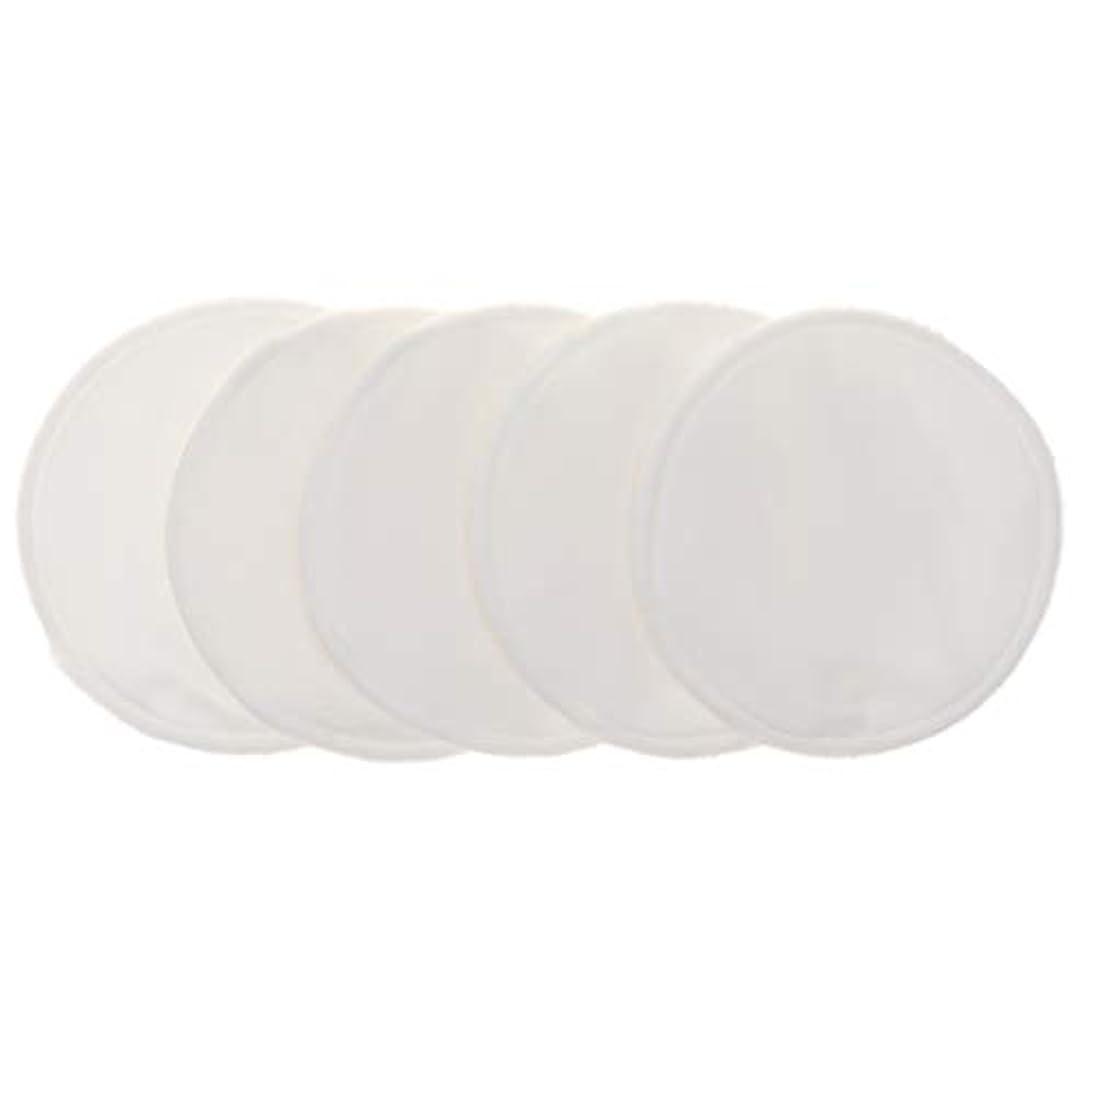 Fenteer 12cm 胸パッド クレンジングシート 化粧水パッド 竹繊維 円形 洗える 再使用可能 5個 全5色 - 白